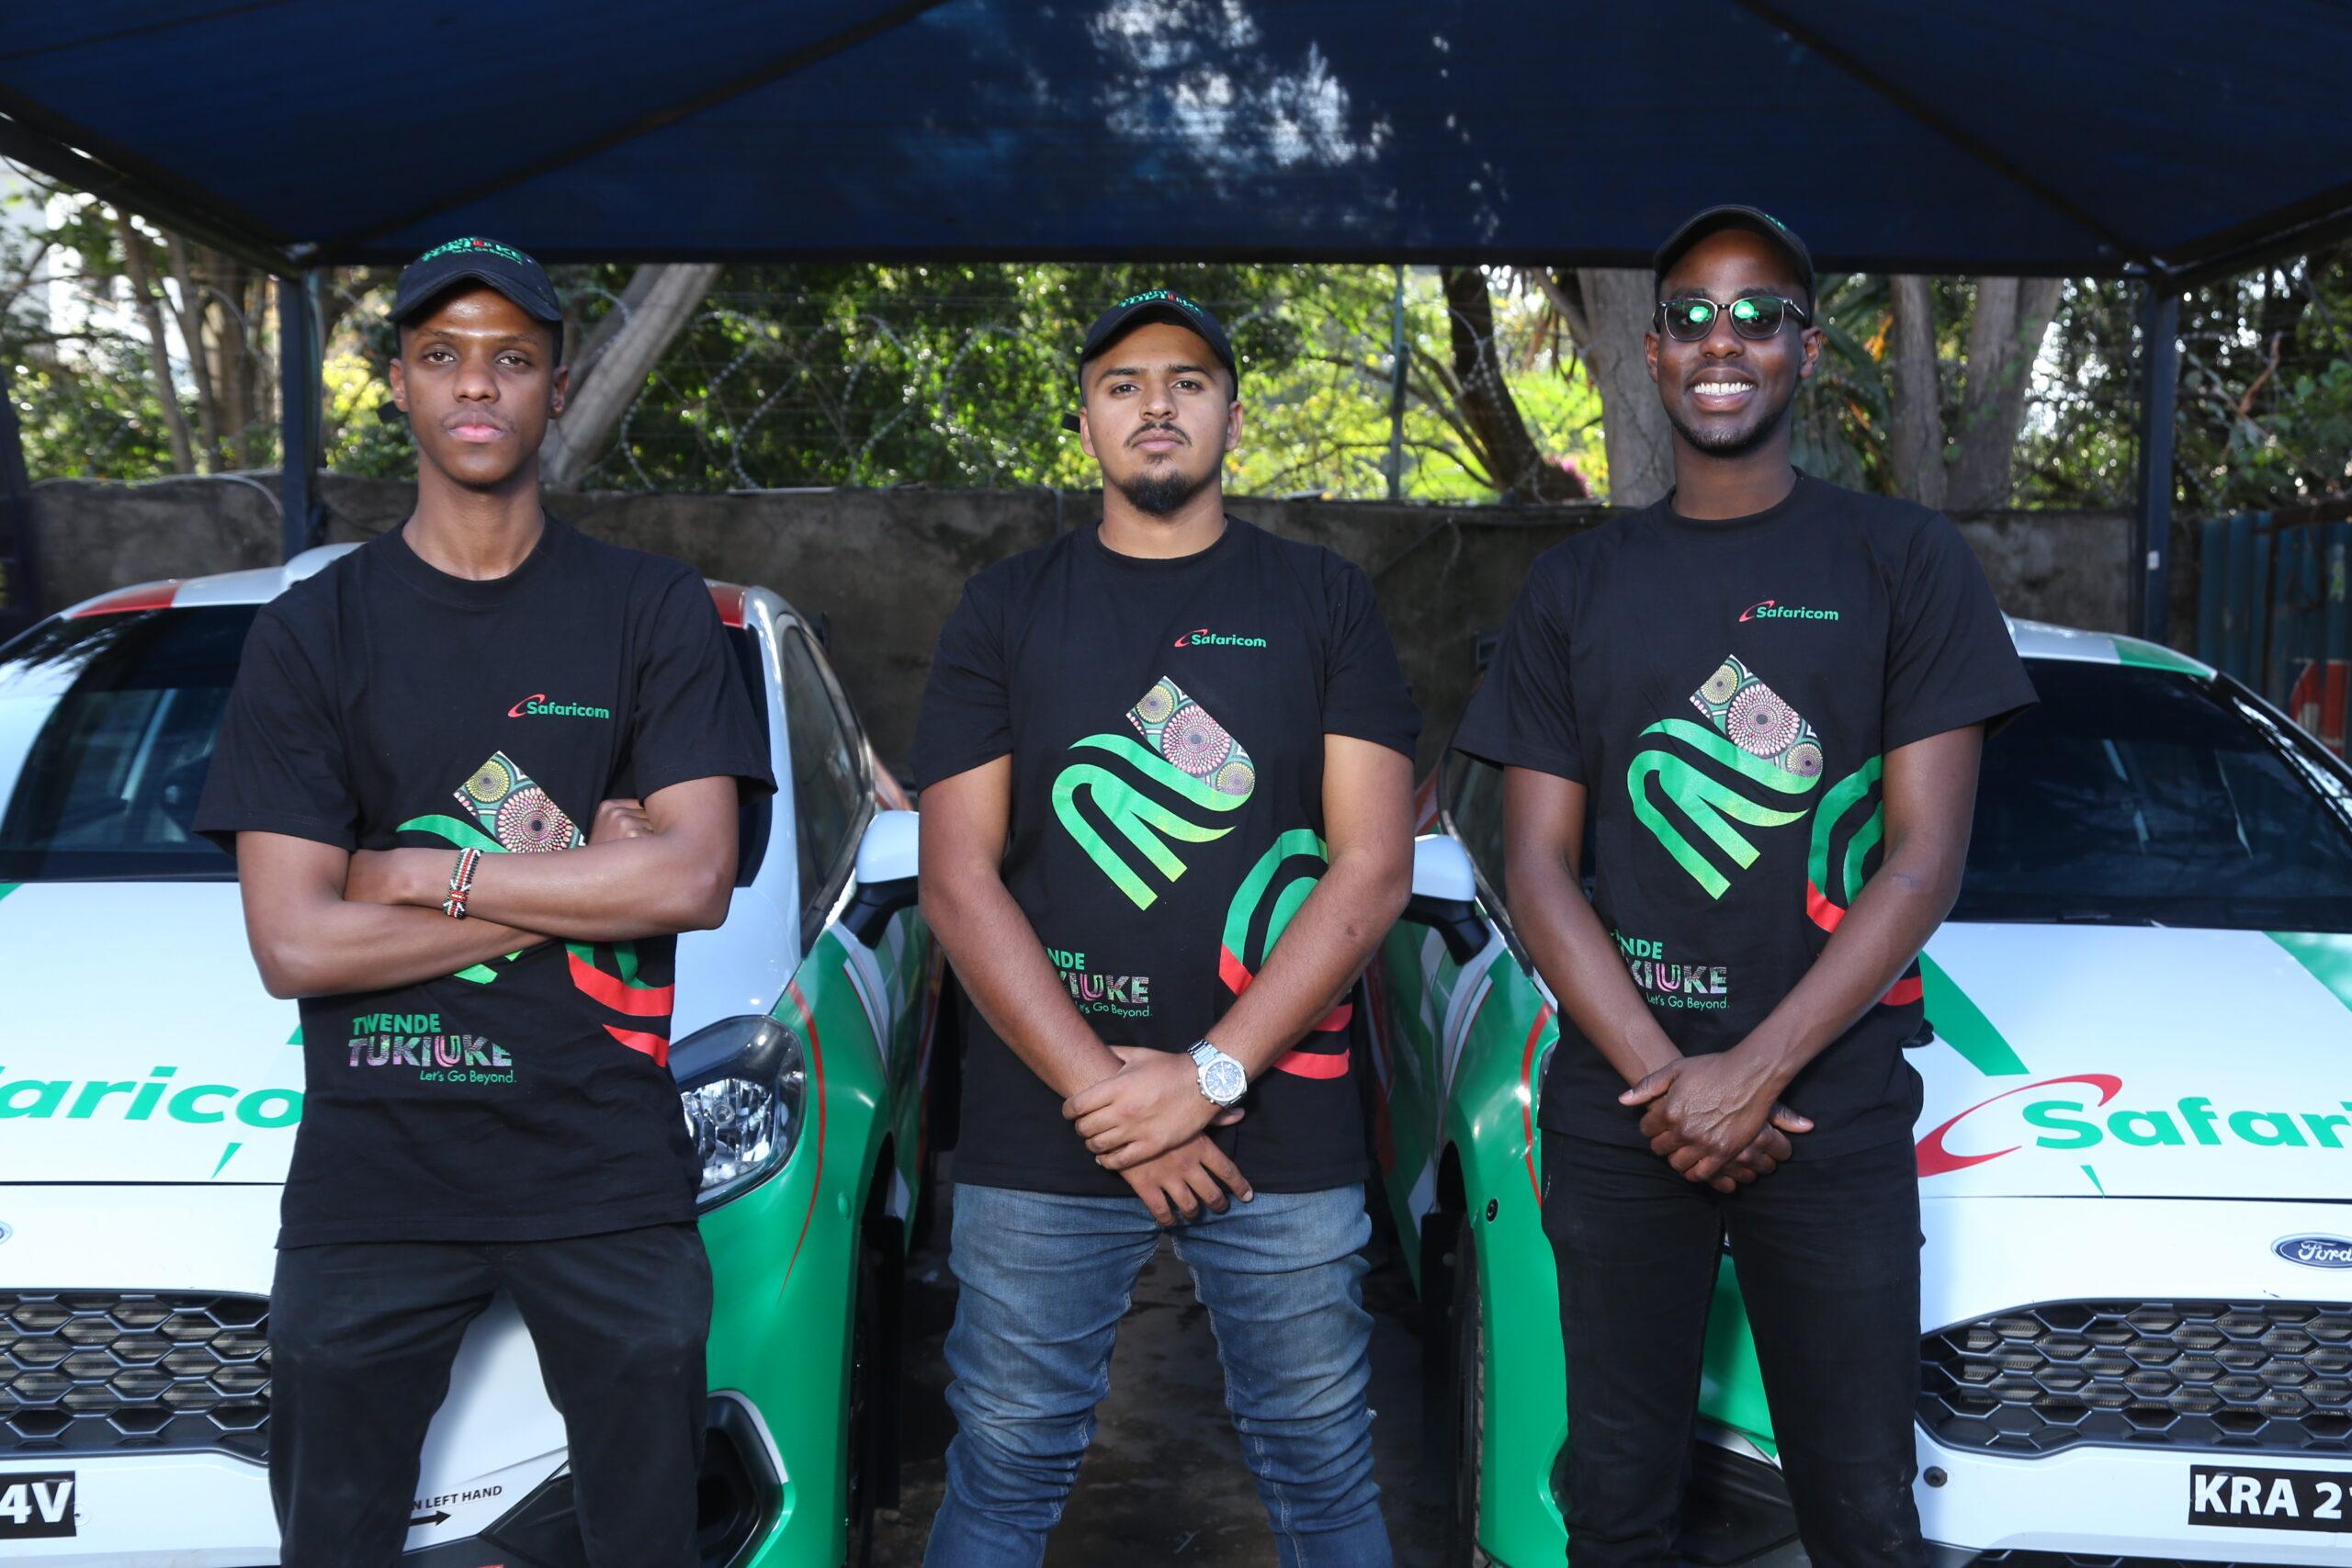 FIA Safaricom Trio in Machakos to Challenge for Rally Top Honours